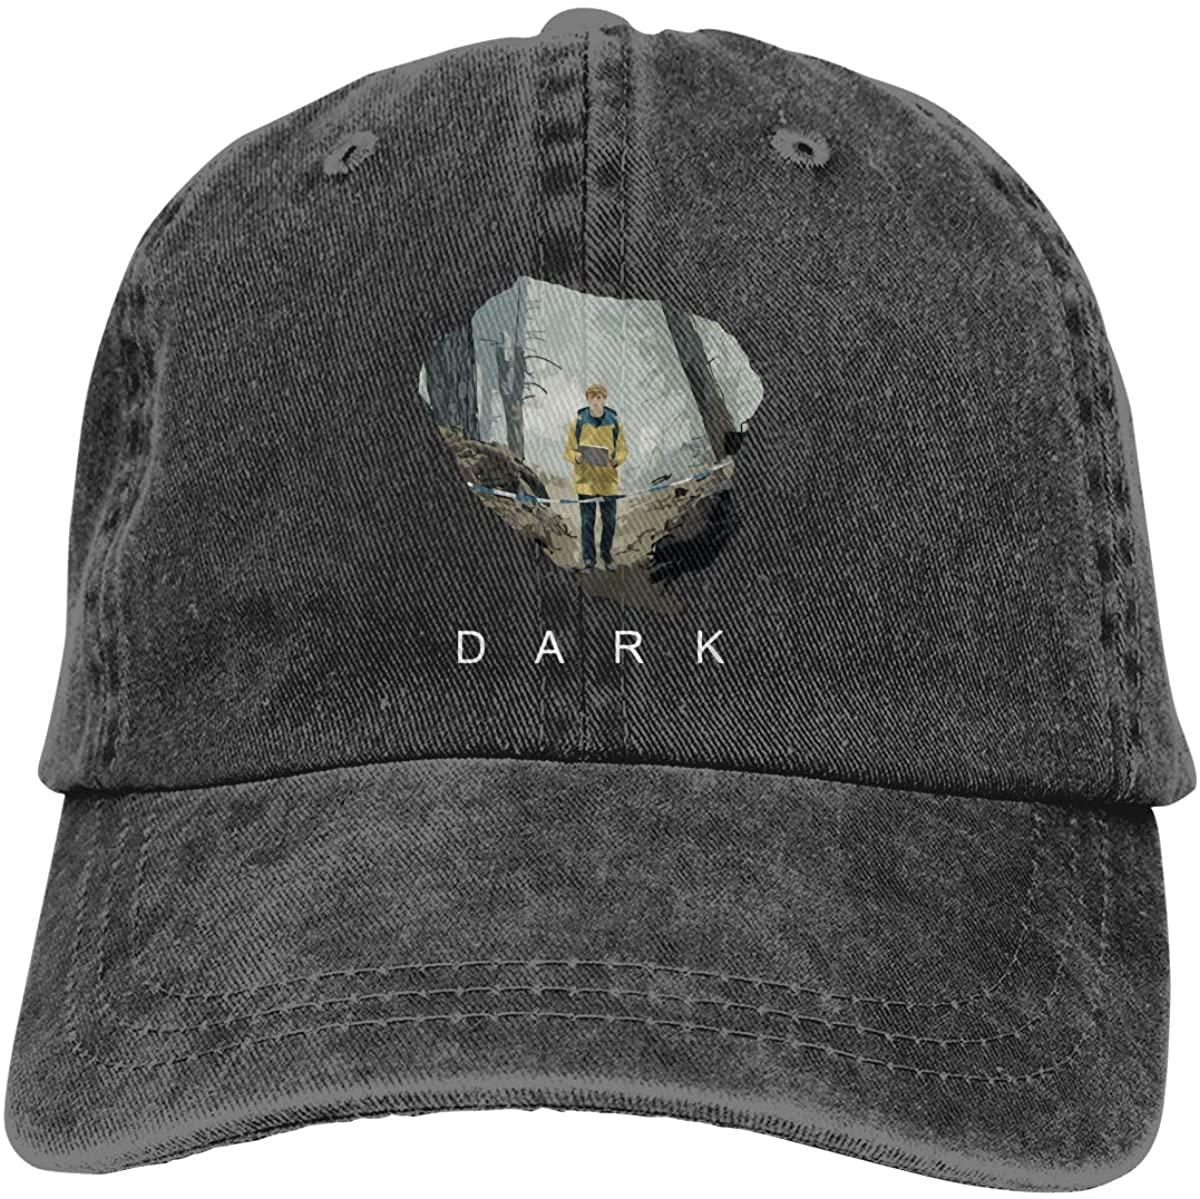 Zfy Dark-Jon=As Adjustable Unisex Hat Baseball Caps Black